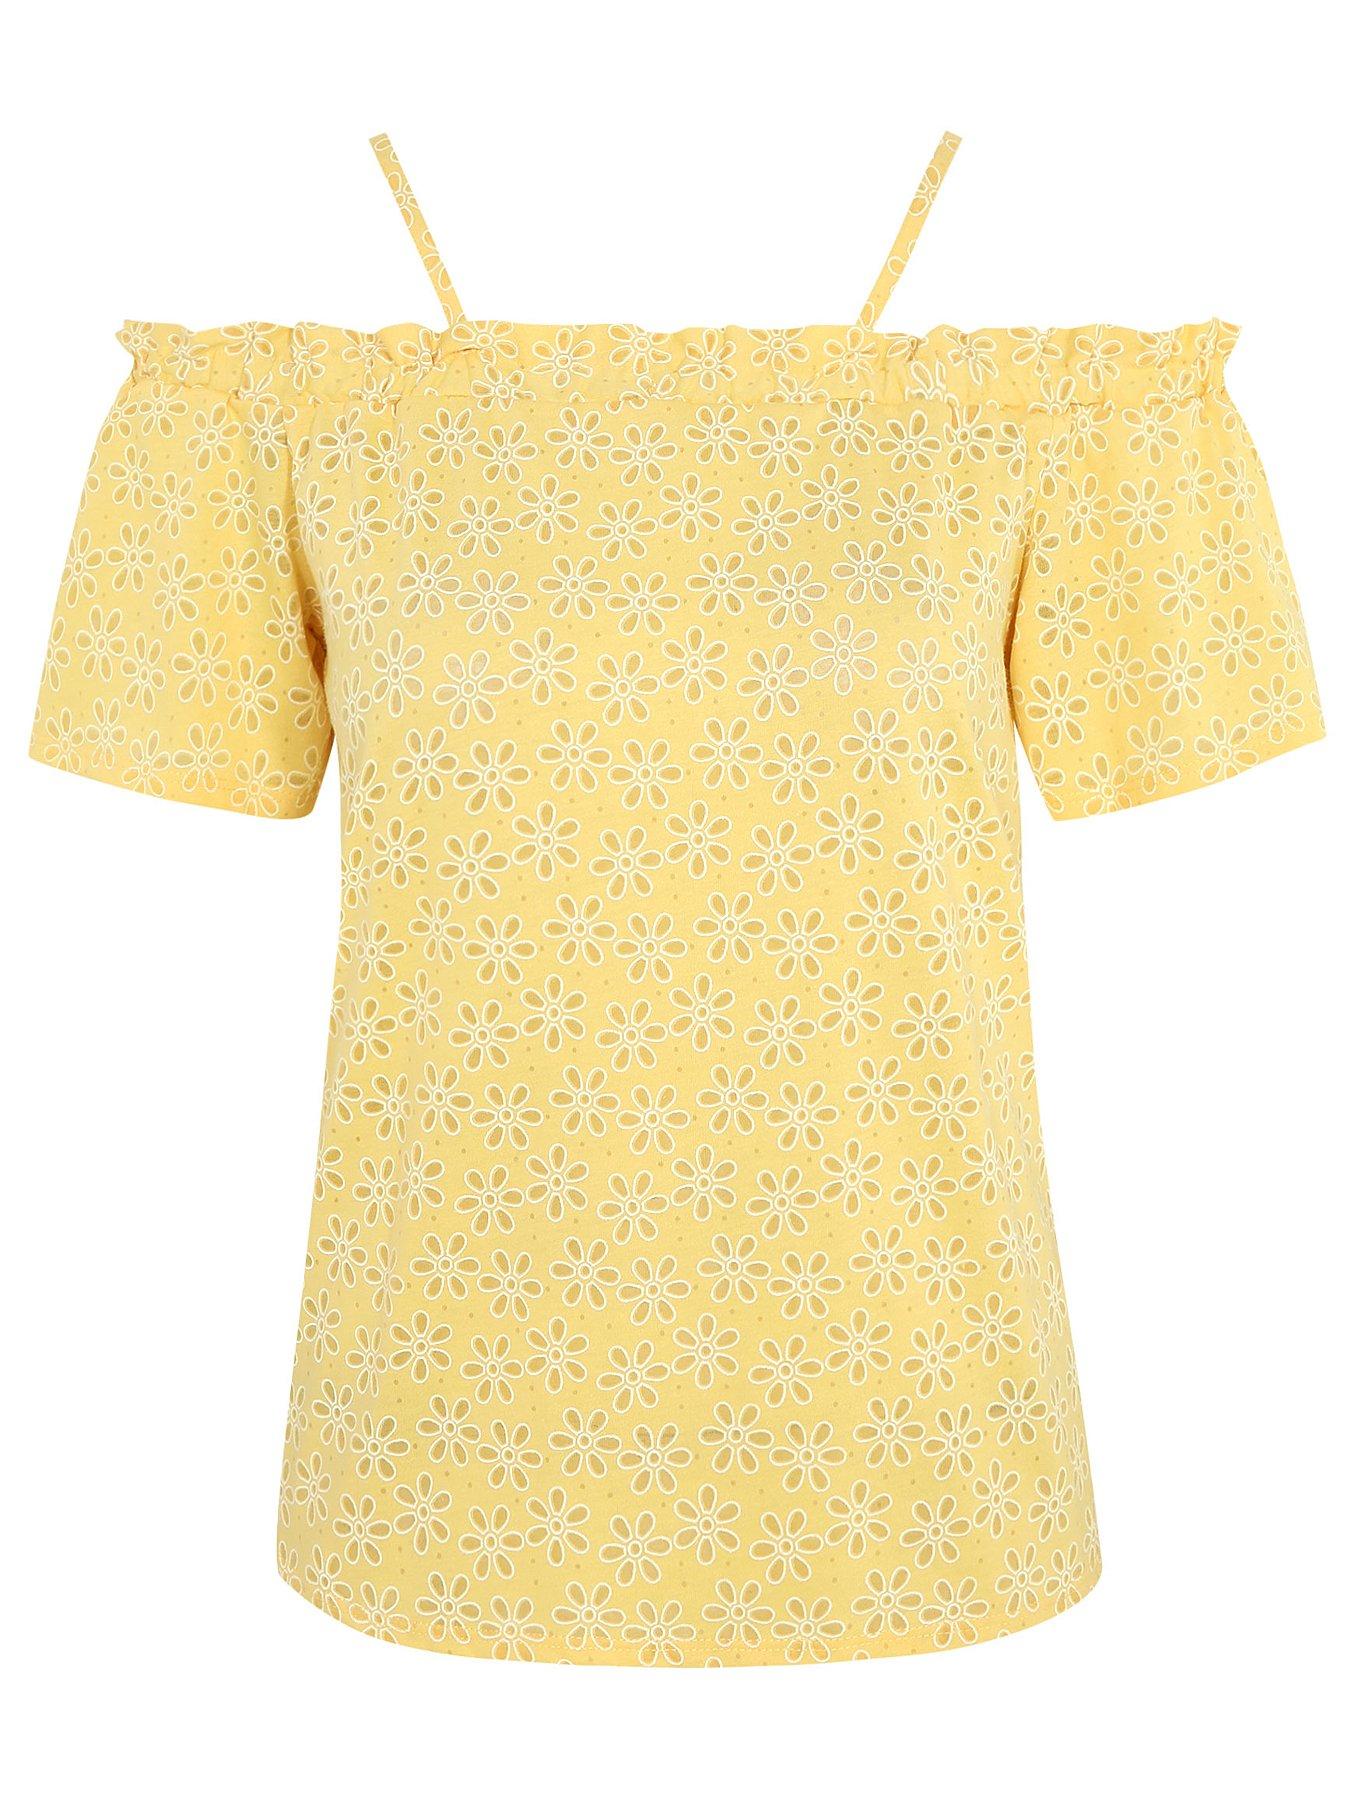 7223307b37f Yellow Floral Burnout Bardot Top